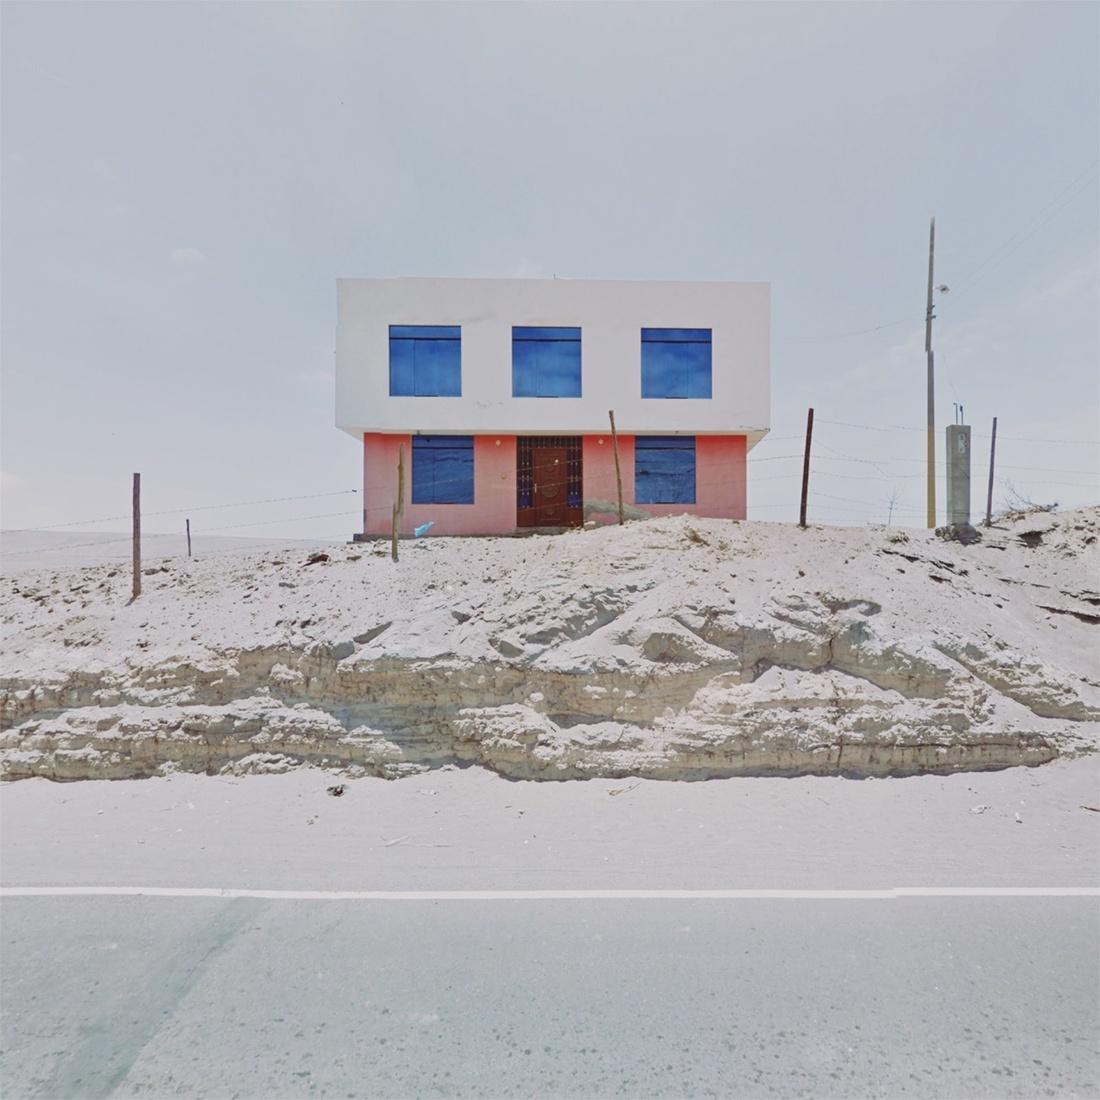 Arequipa, Peru. Photograph by Jacqui Kenny via Google Street View.